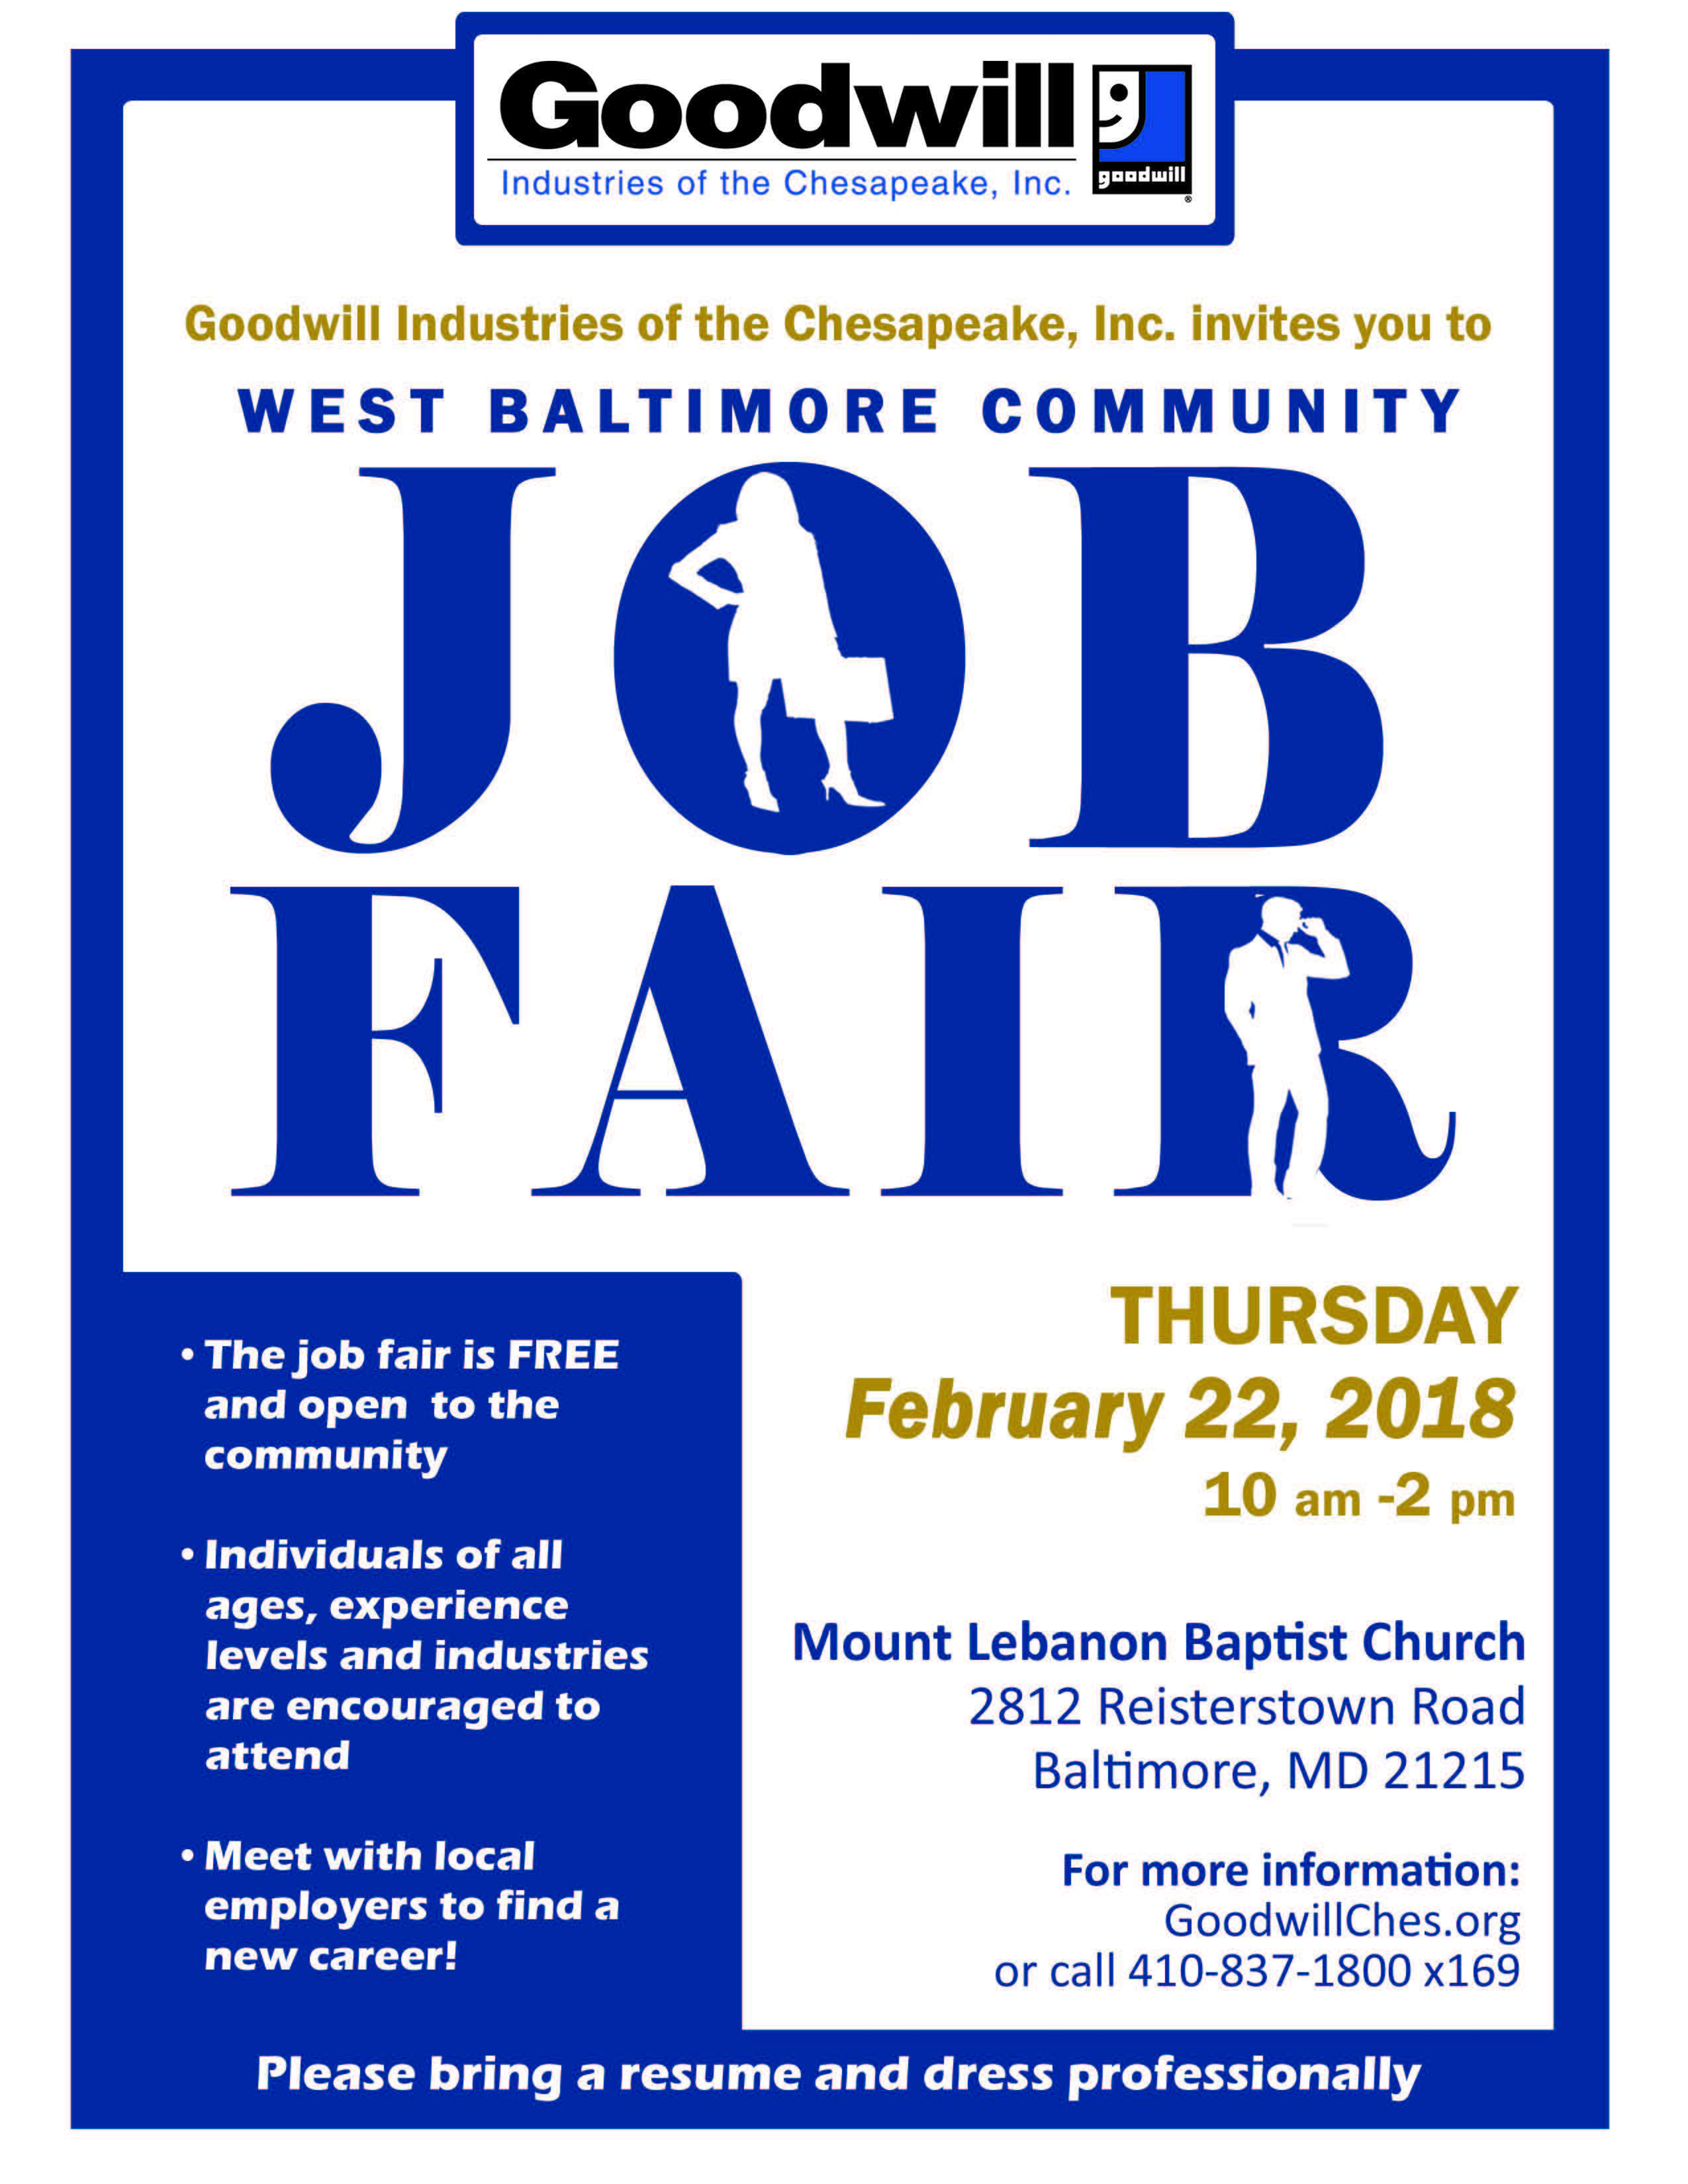 West Baltimore Community Job Fair @ Mount Lebanon Baptist Church | Baltimore | Maryland | United States